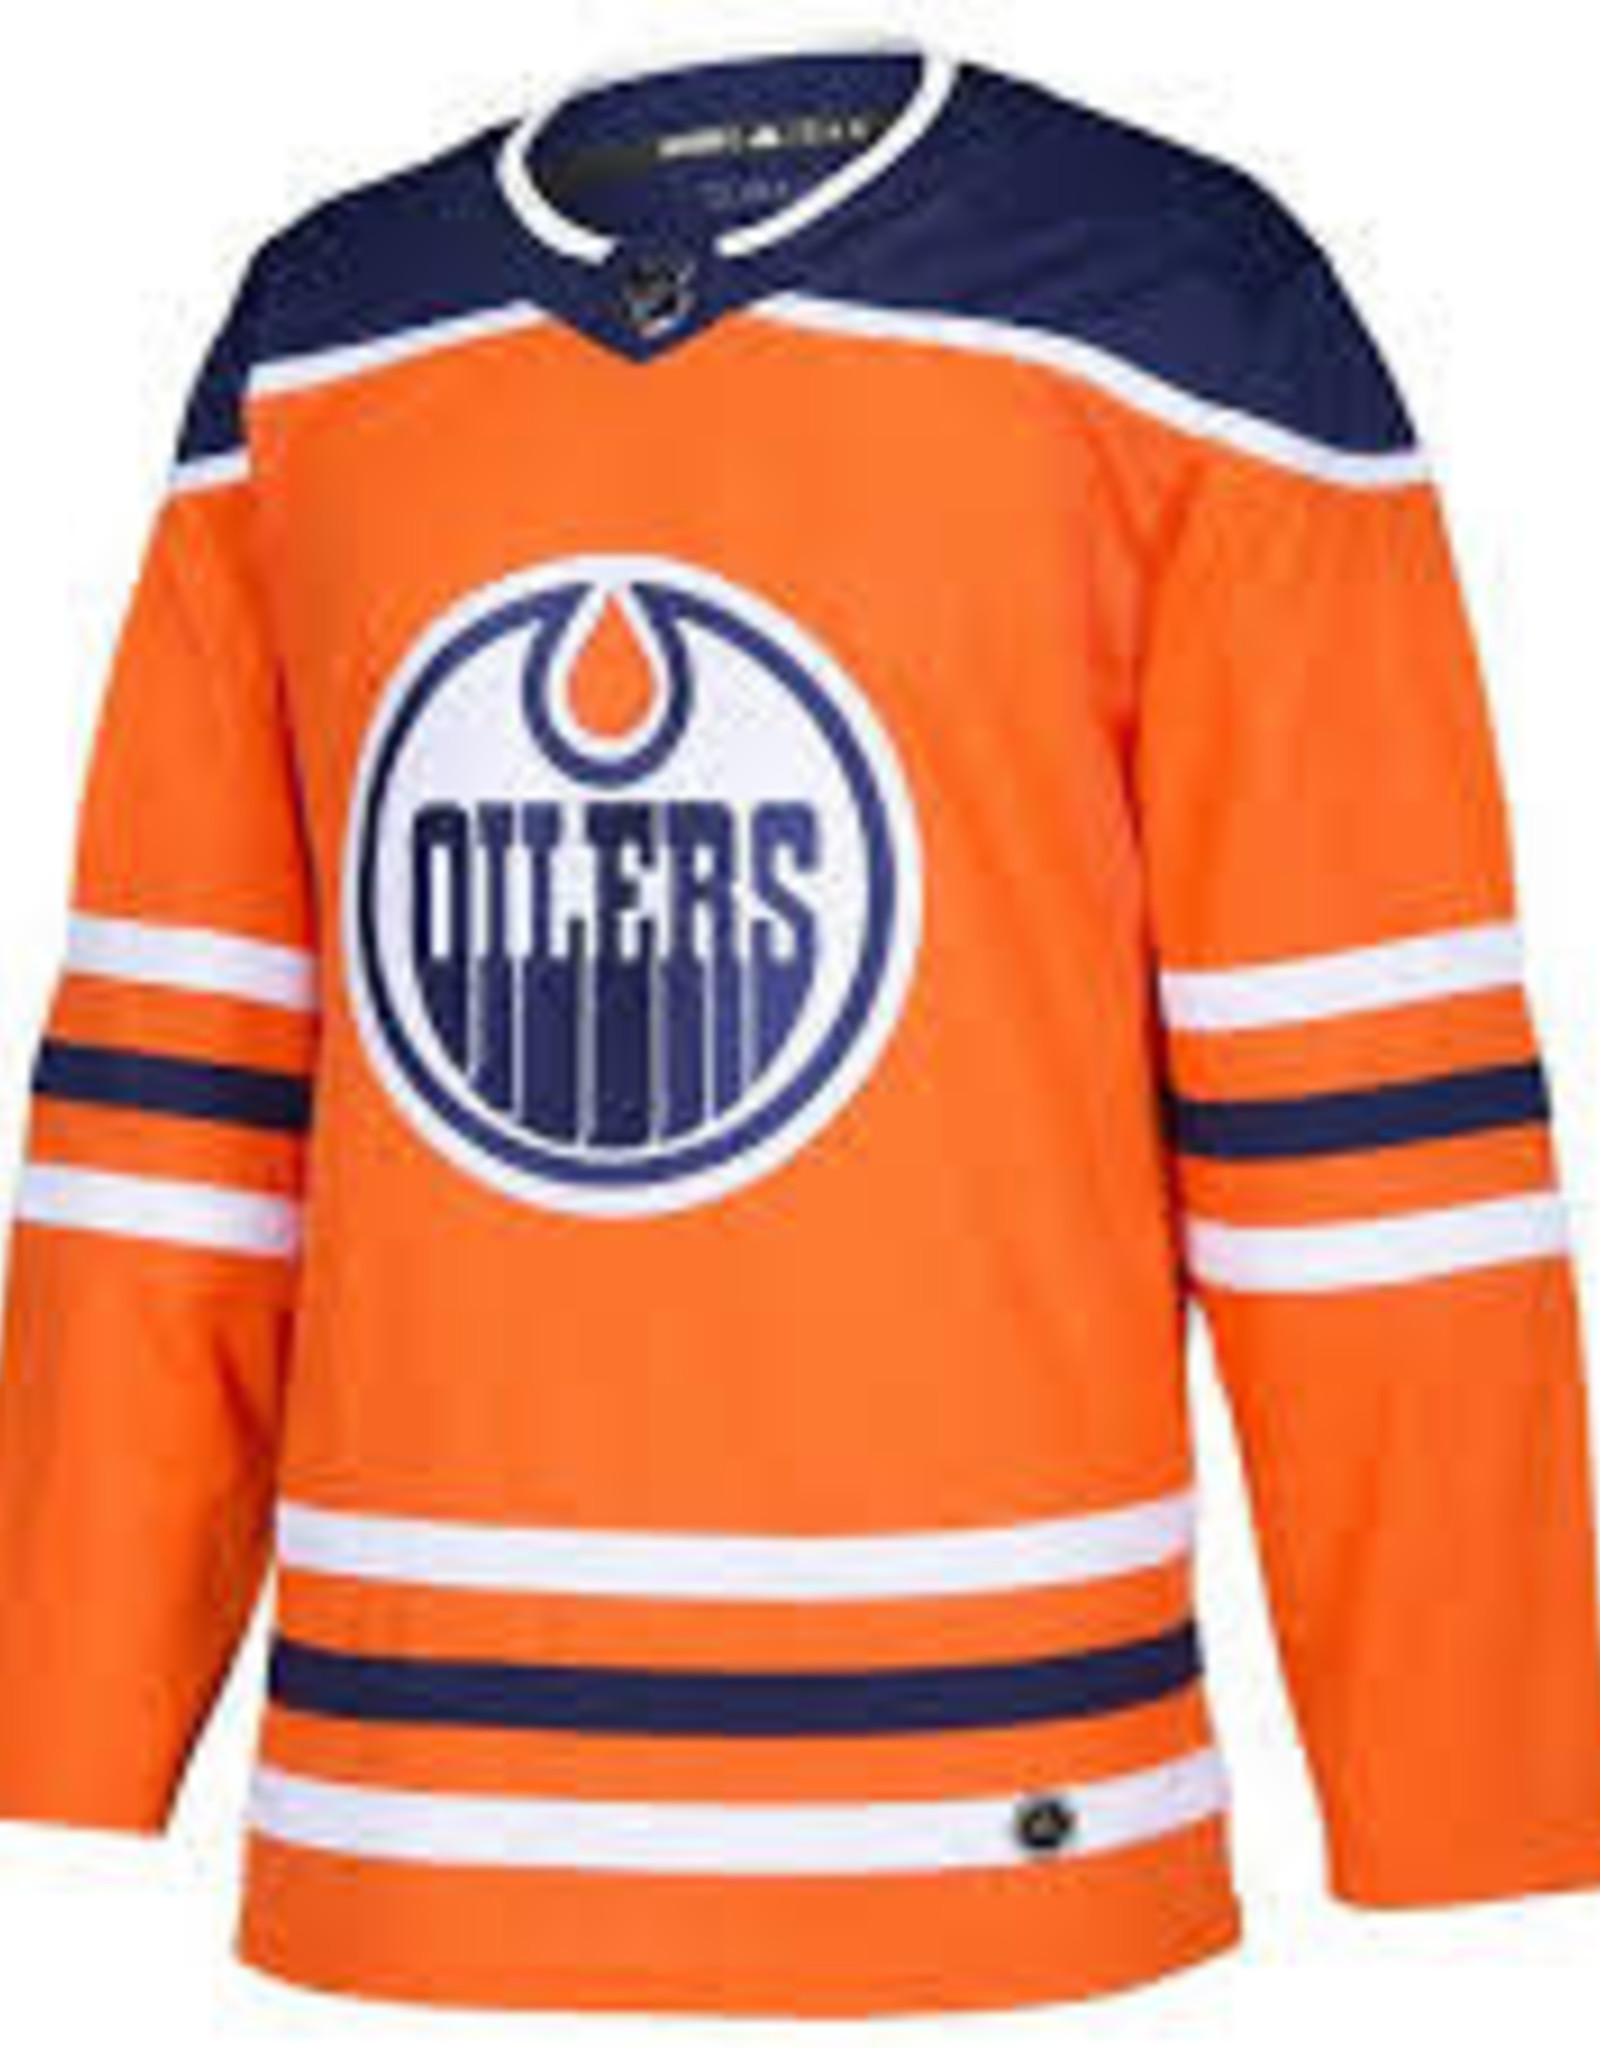 ADIDAS ADIDAS NHL ON ICE JERSEY OILERS